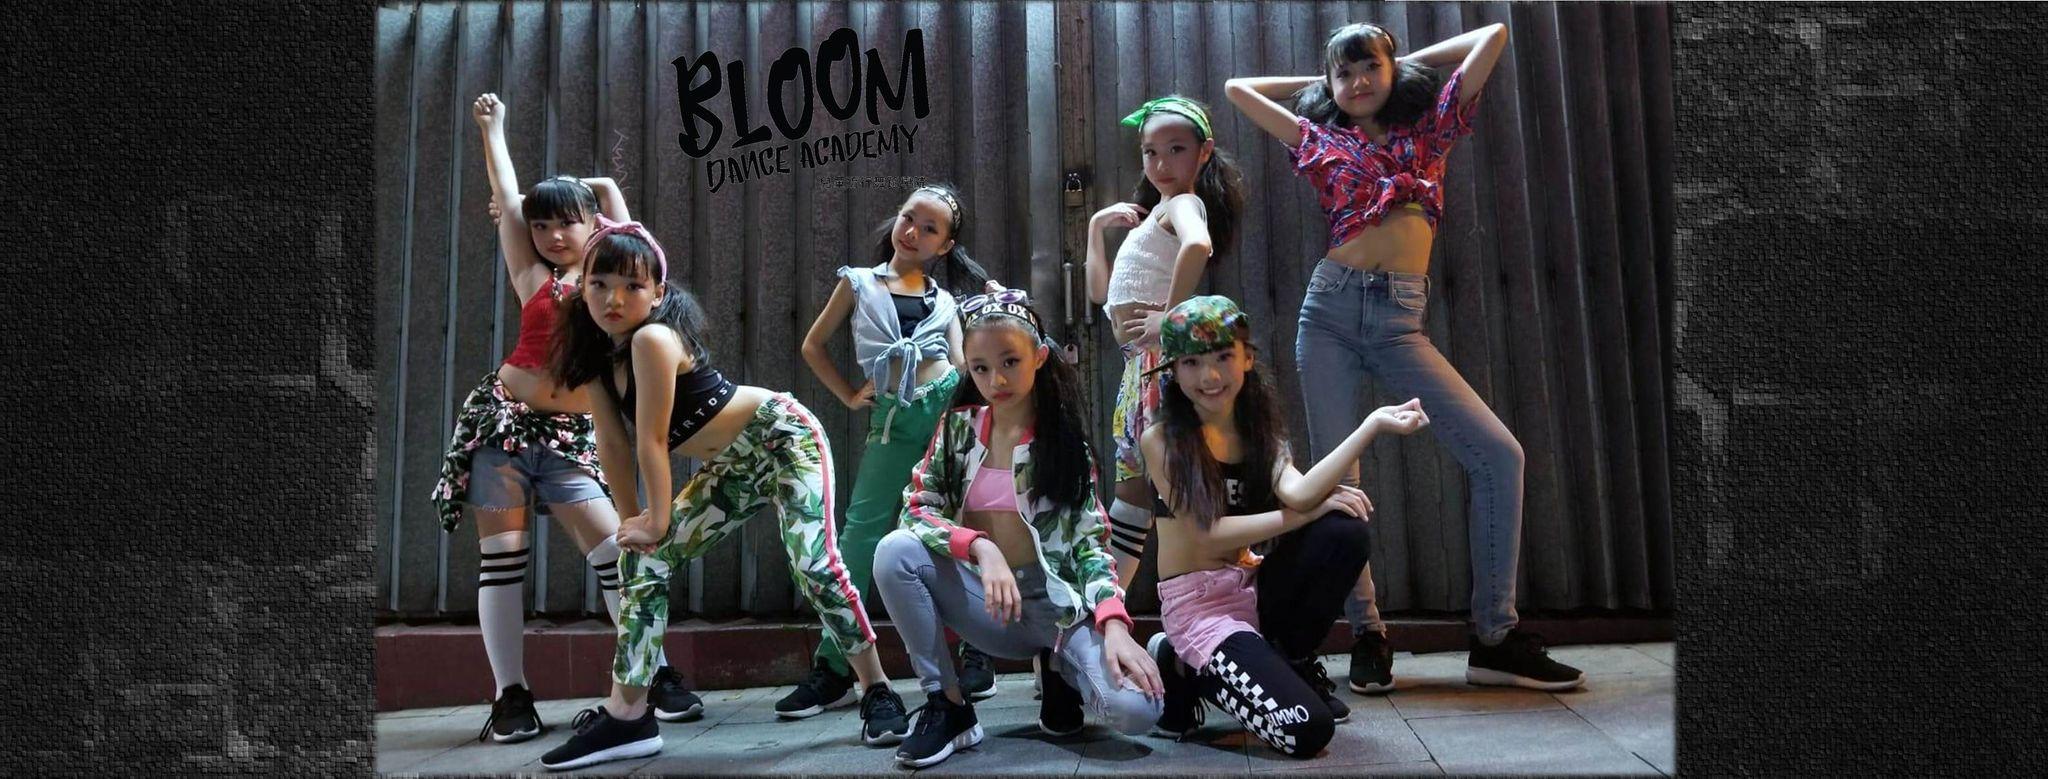 Bloom Dance Academy儿童流行舞蹈学院